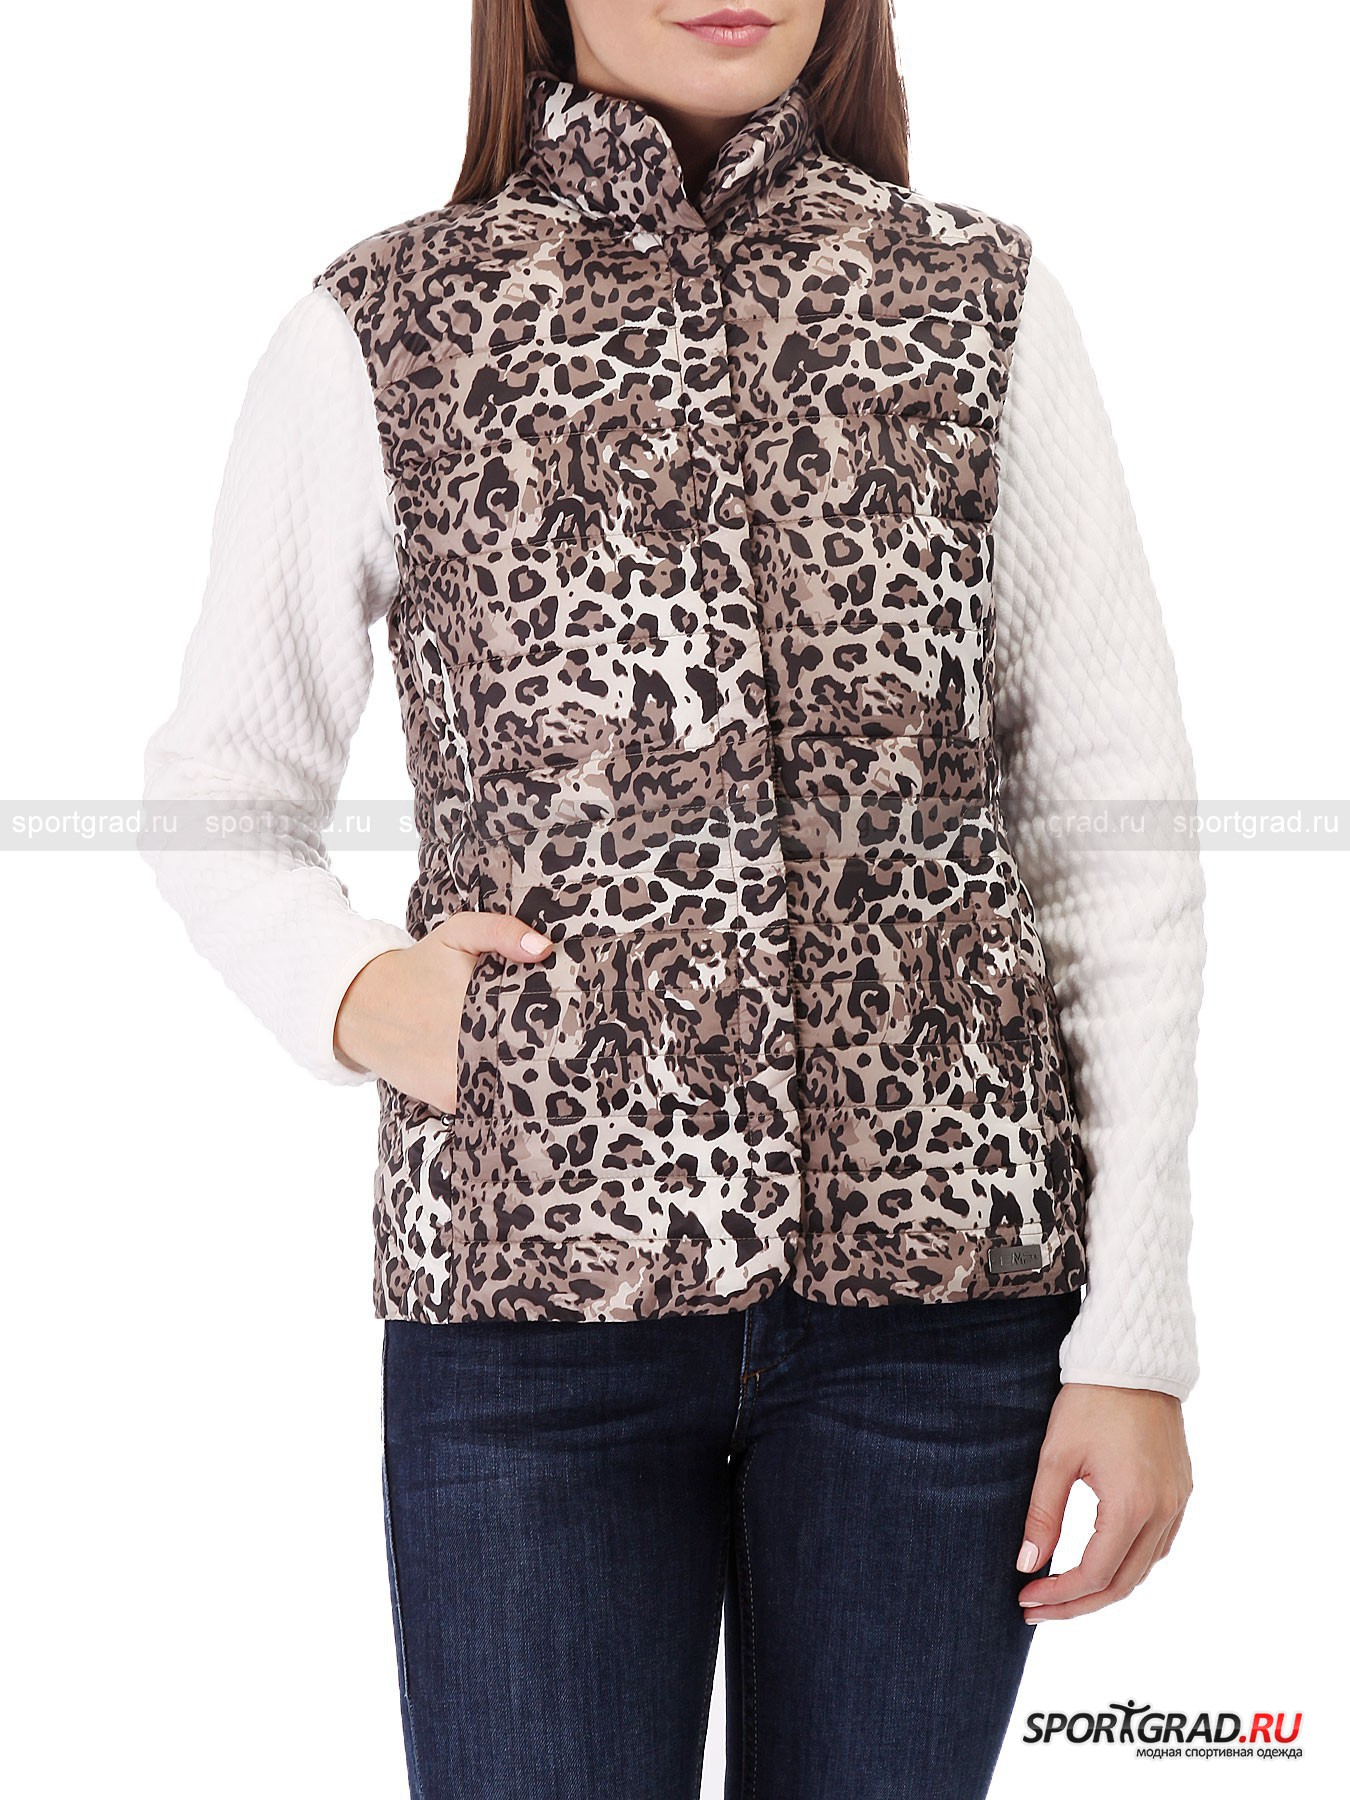 Жилет женский Vest CAMPAGNOLO